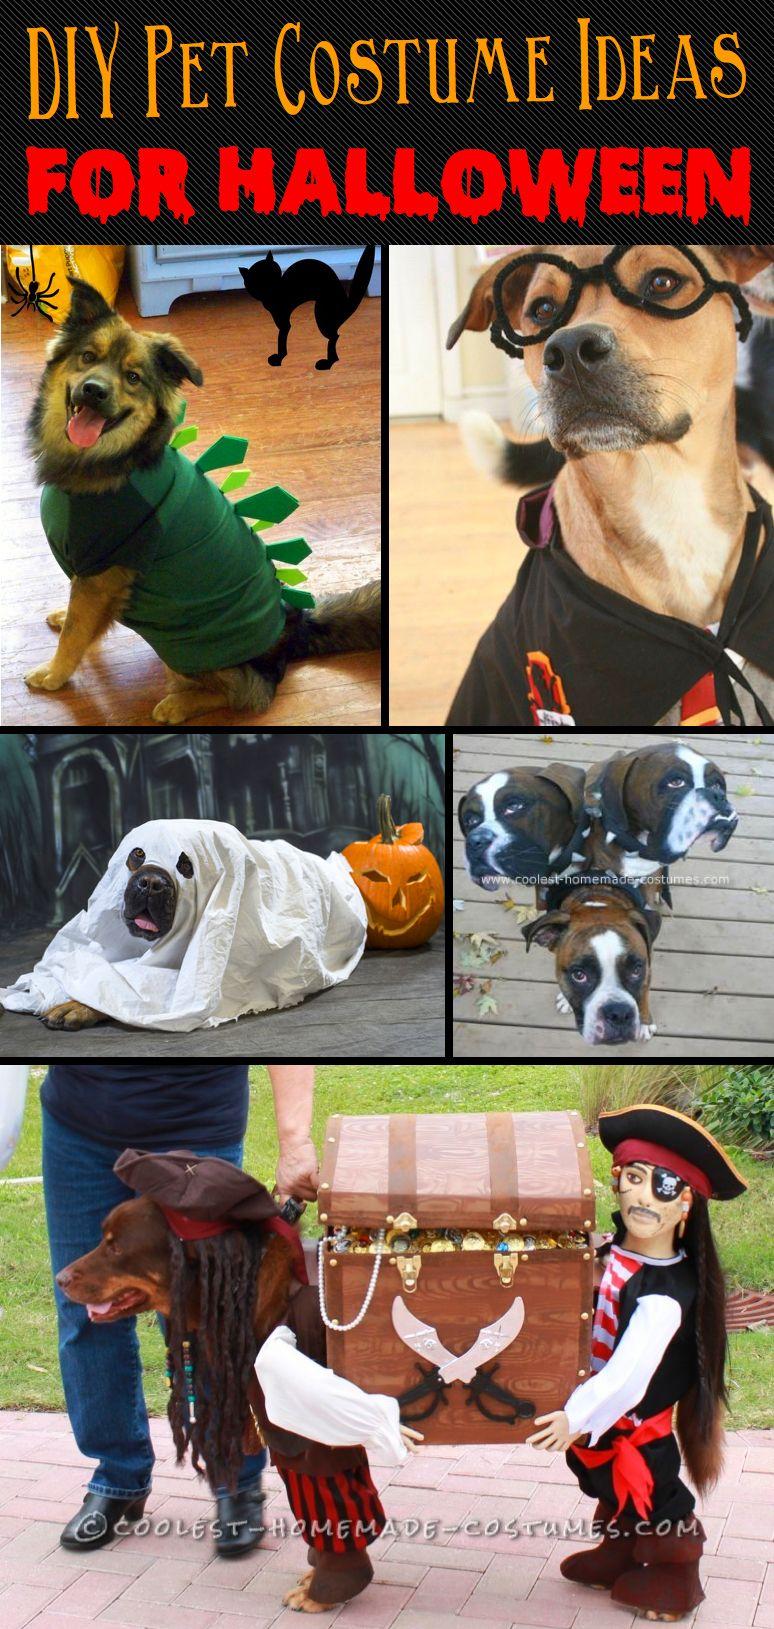 20 Adorable Diy Pet Costume Ideas For Halloween 2017 Pet